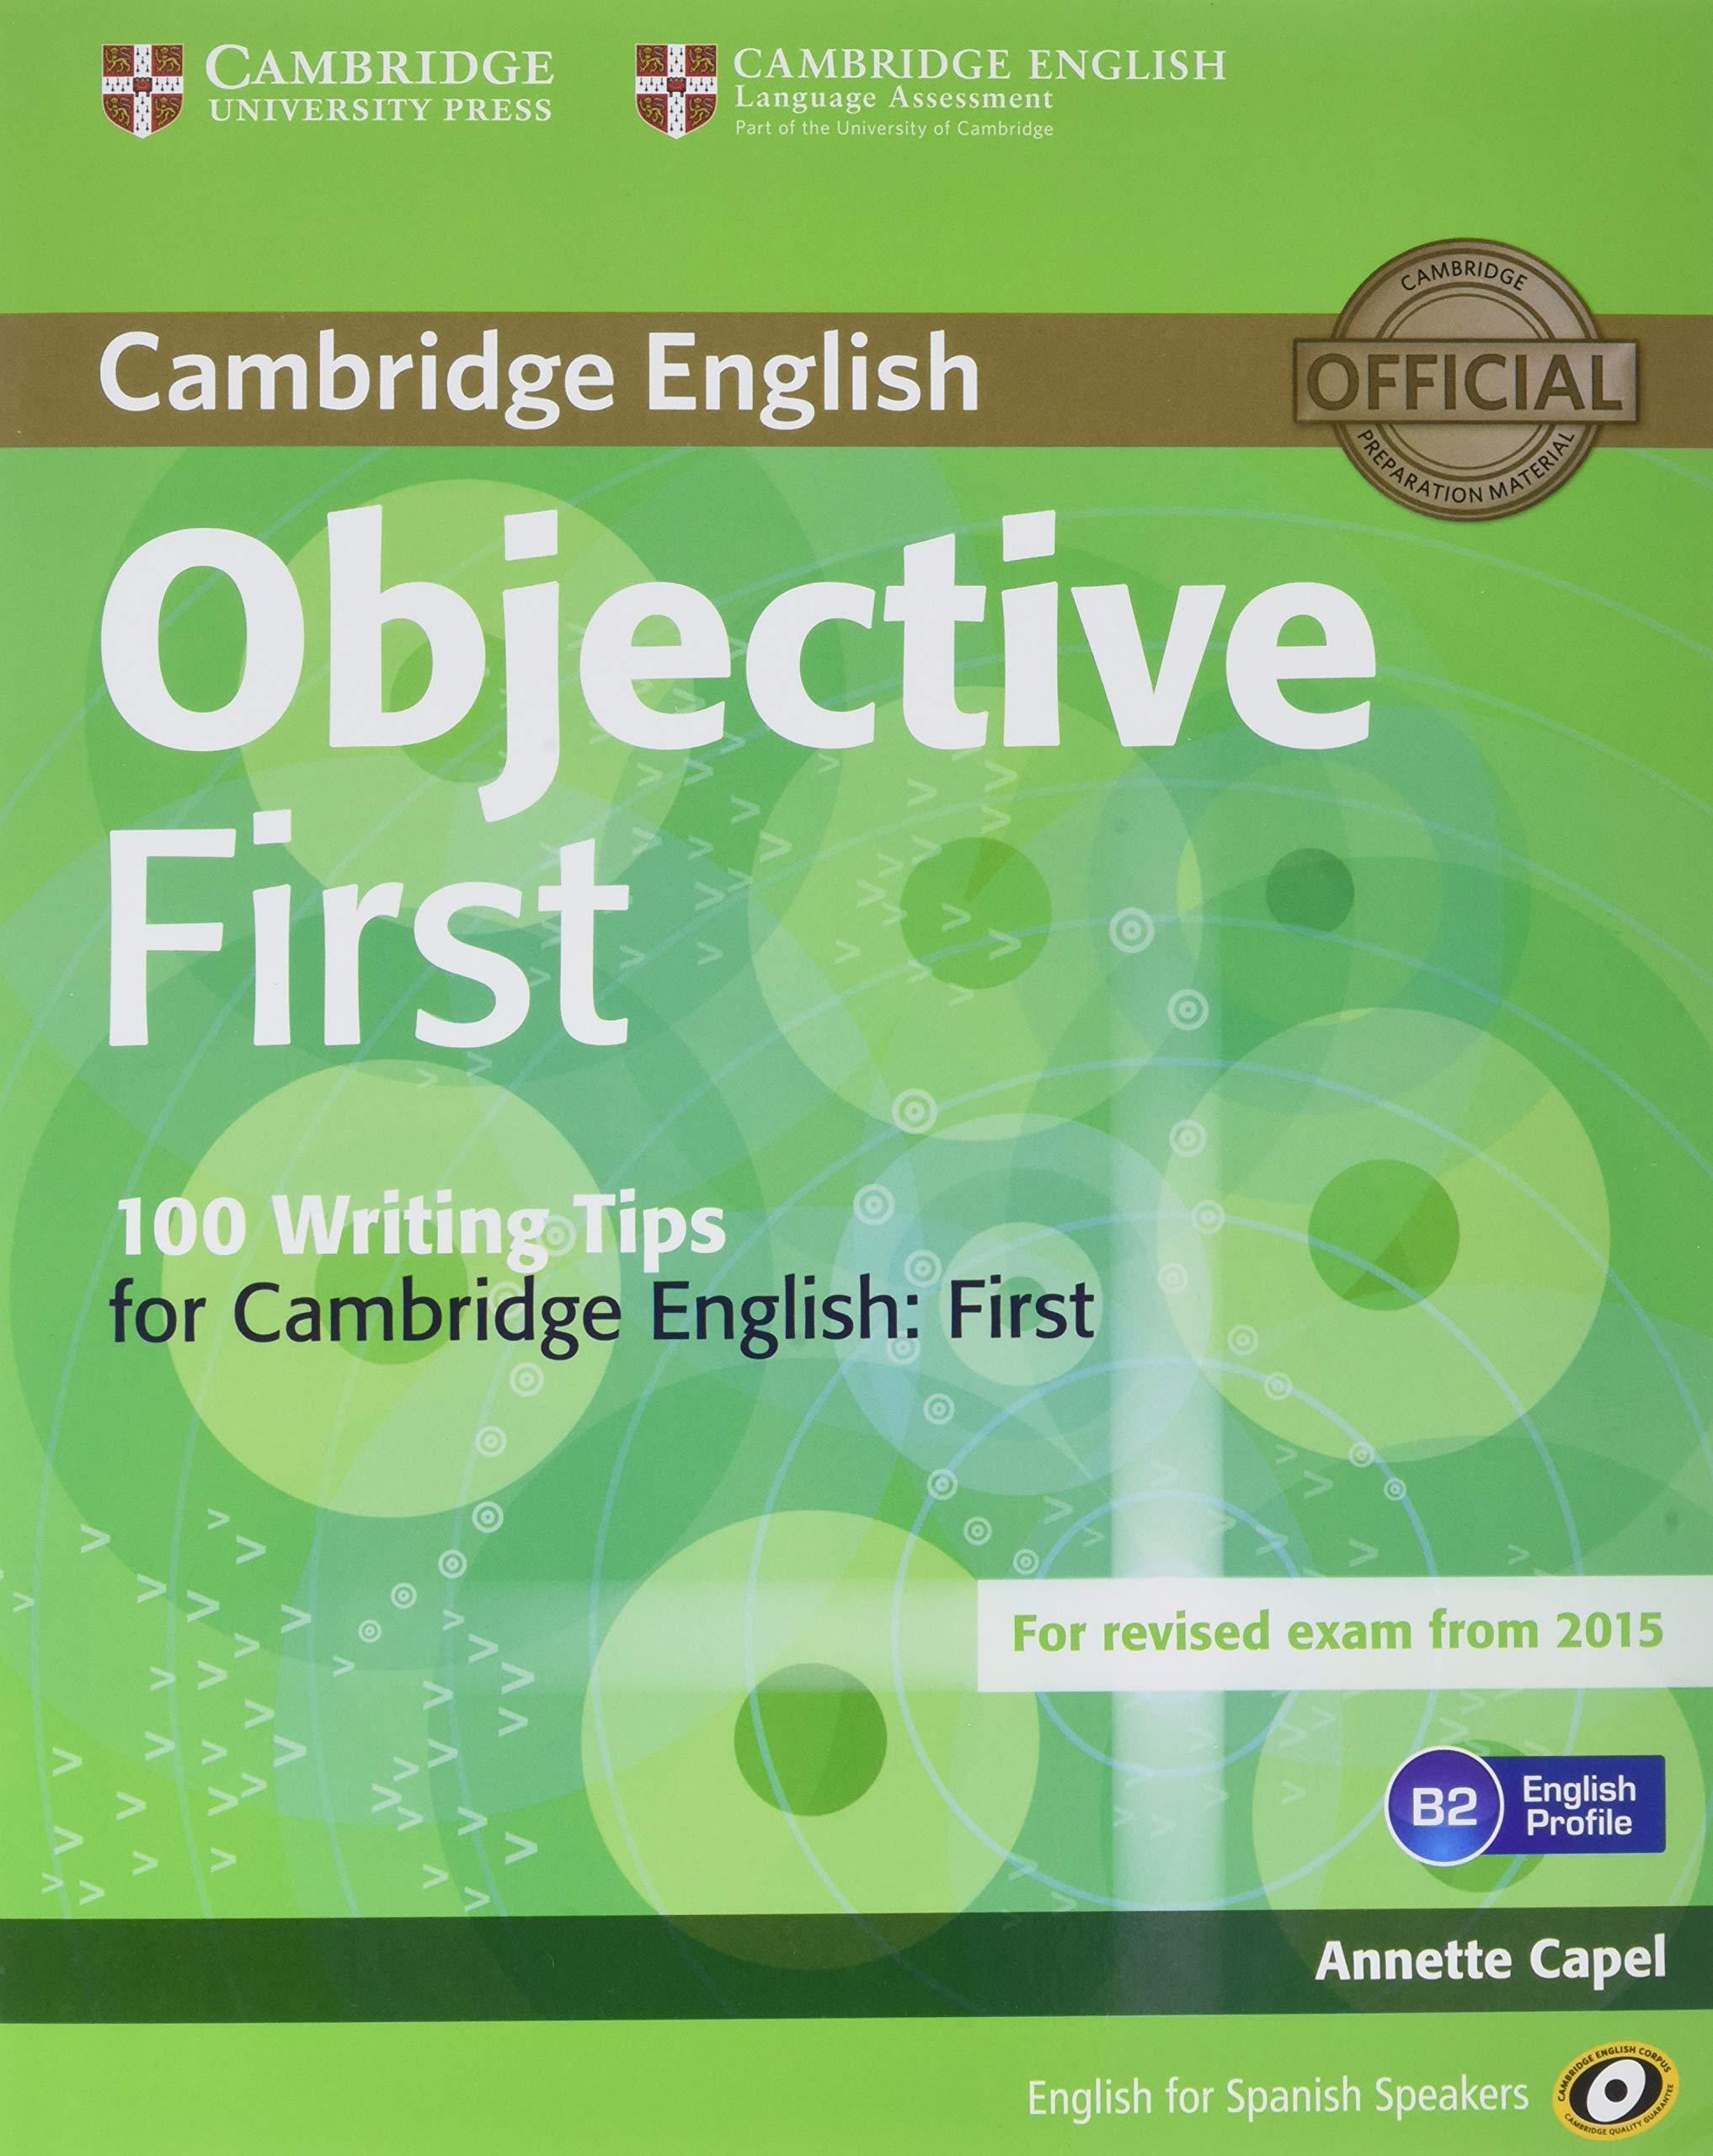 منابع آزمون fce کتاب اول Objective First